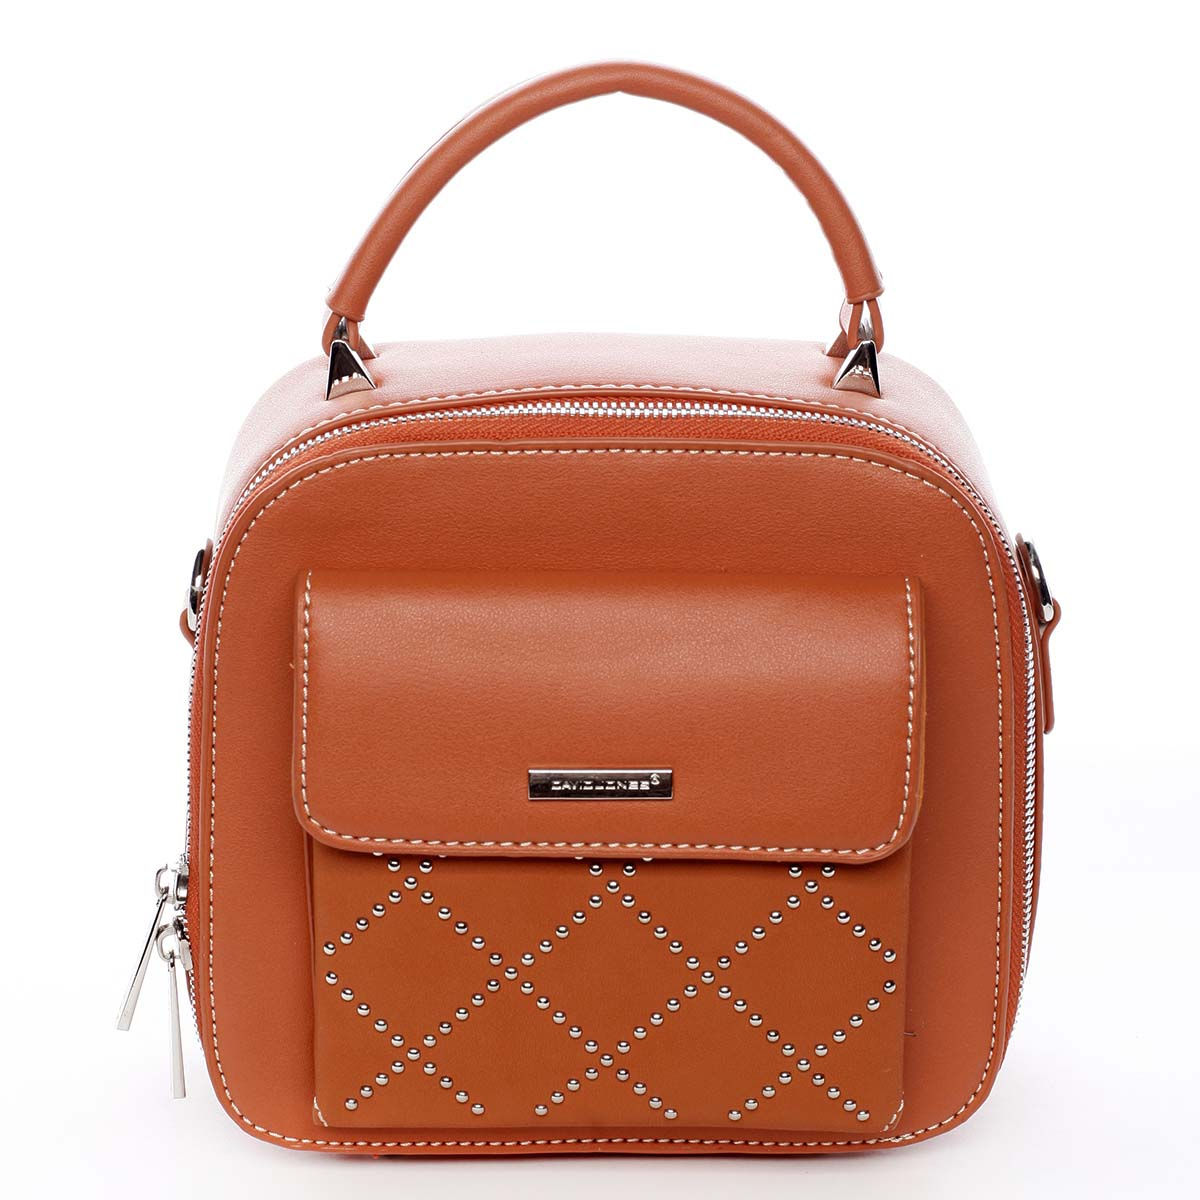 Luxusná malá dámska kabelka do ruky oranžová - David Jones Stela